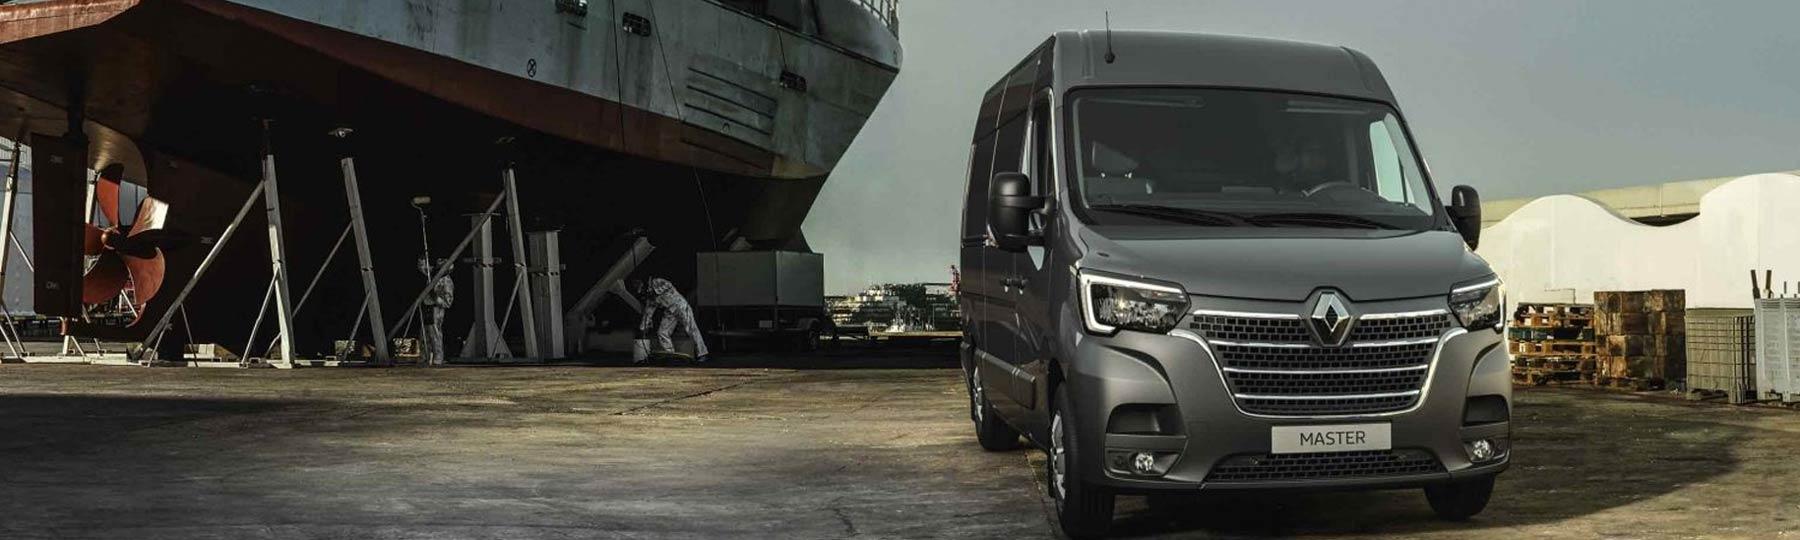 New Renault MASTER New Van Offer